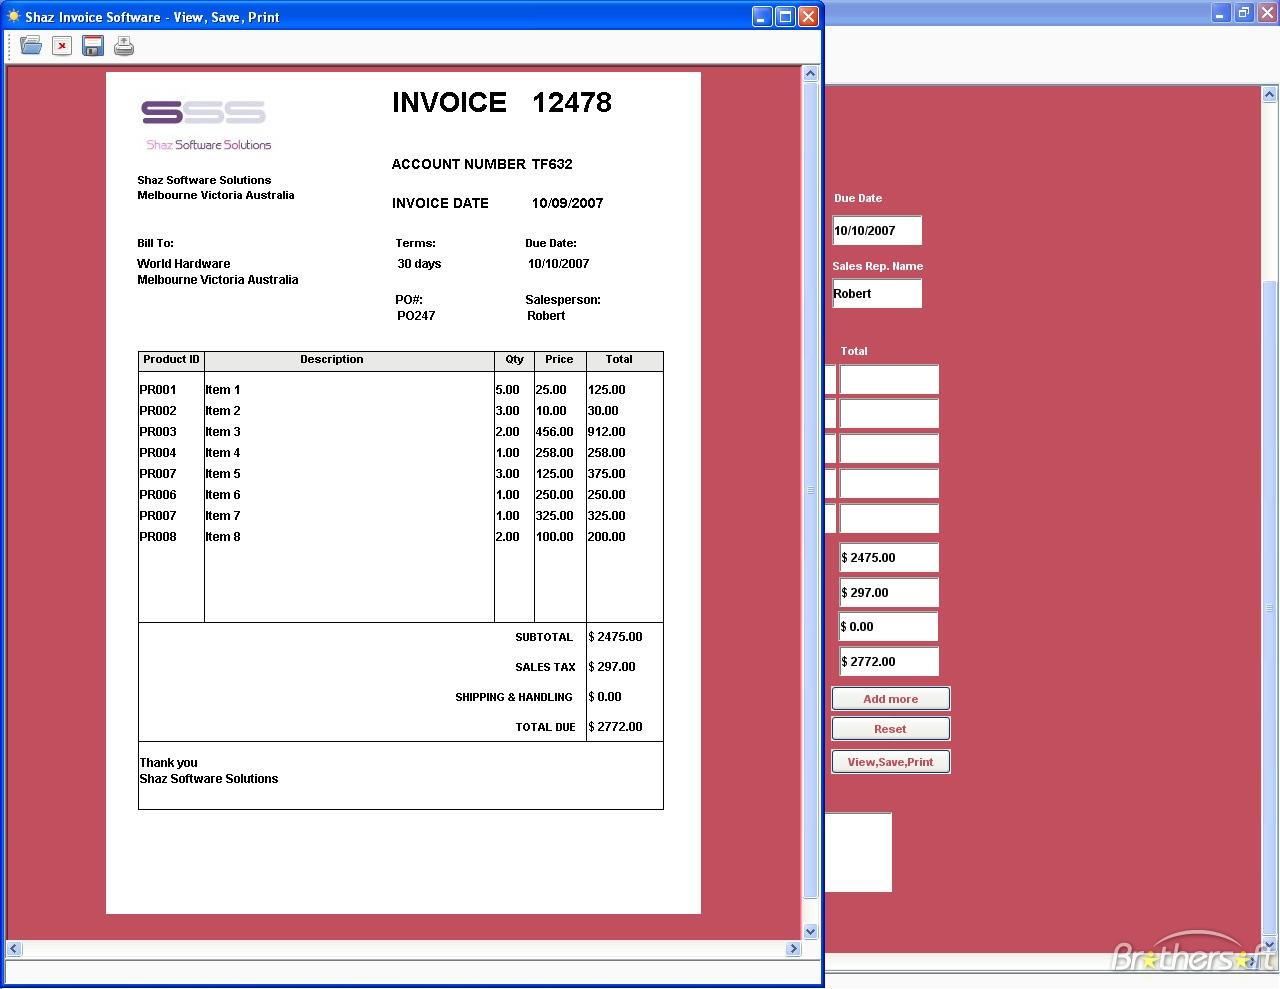 download free shaz invoice software shaz invoice software 100 invoice software download